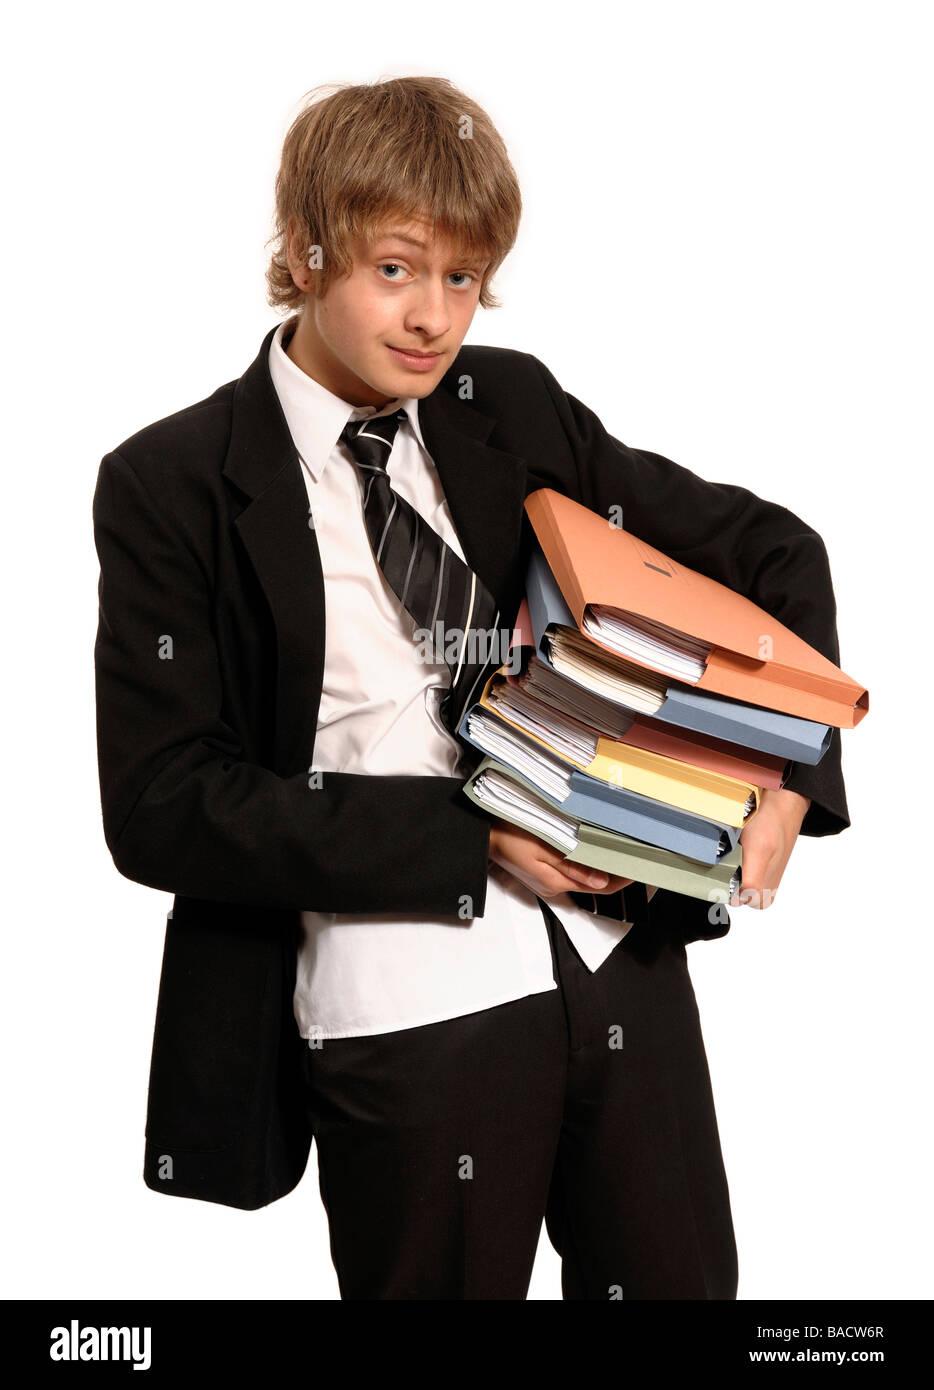 Schoolboy carrying folders - Stock Image